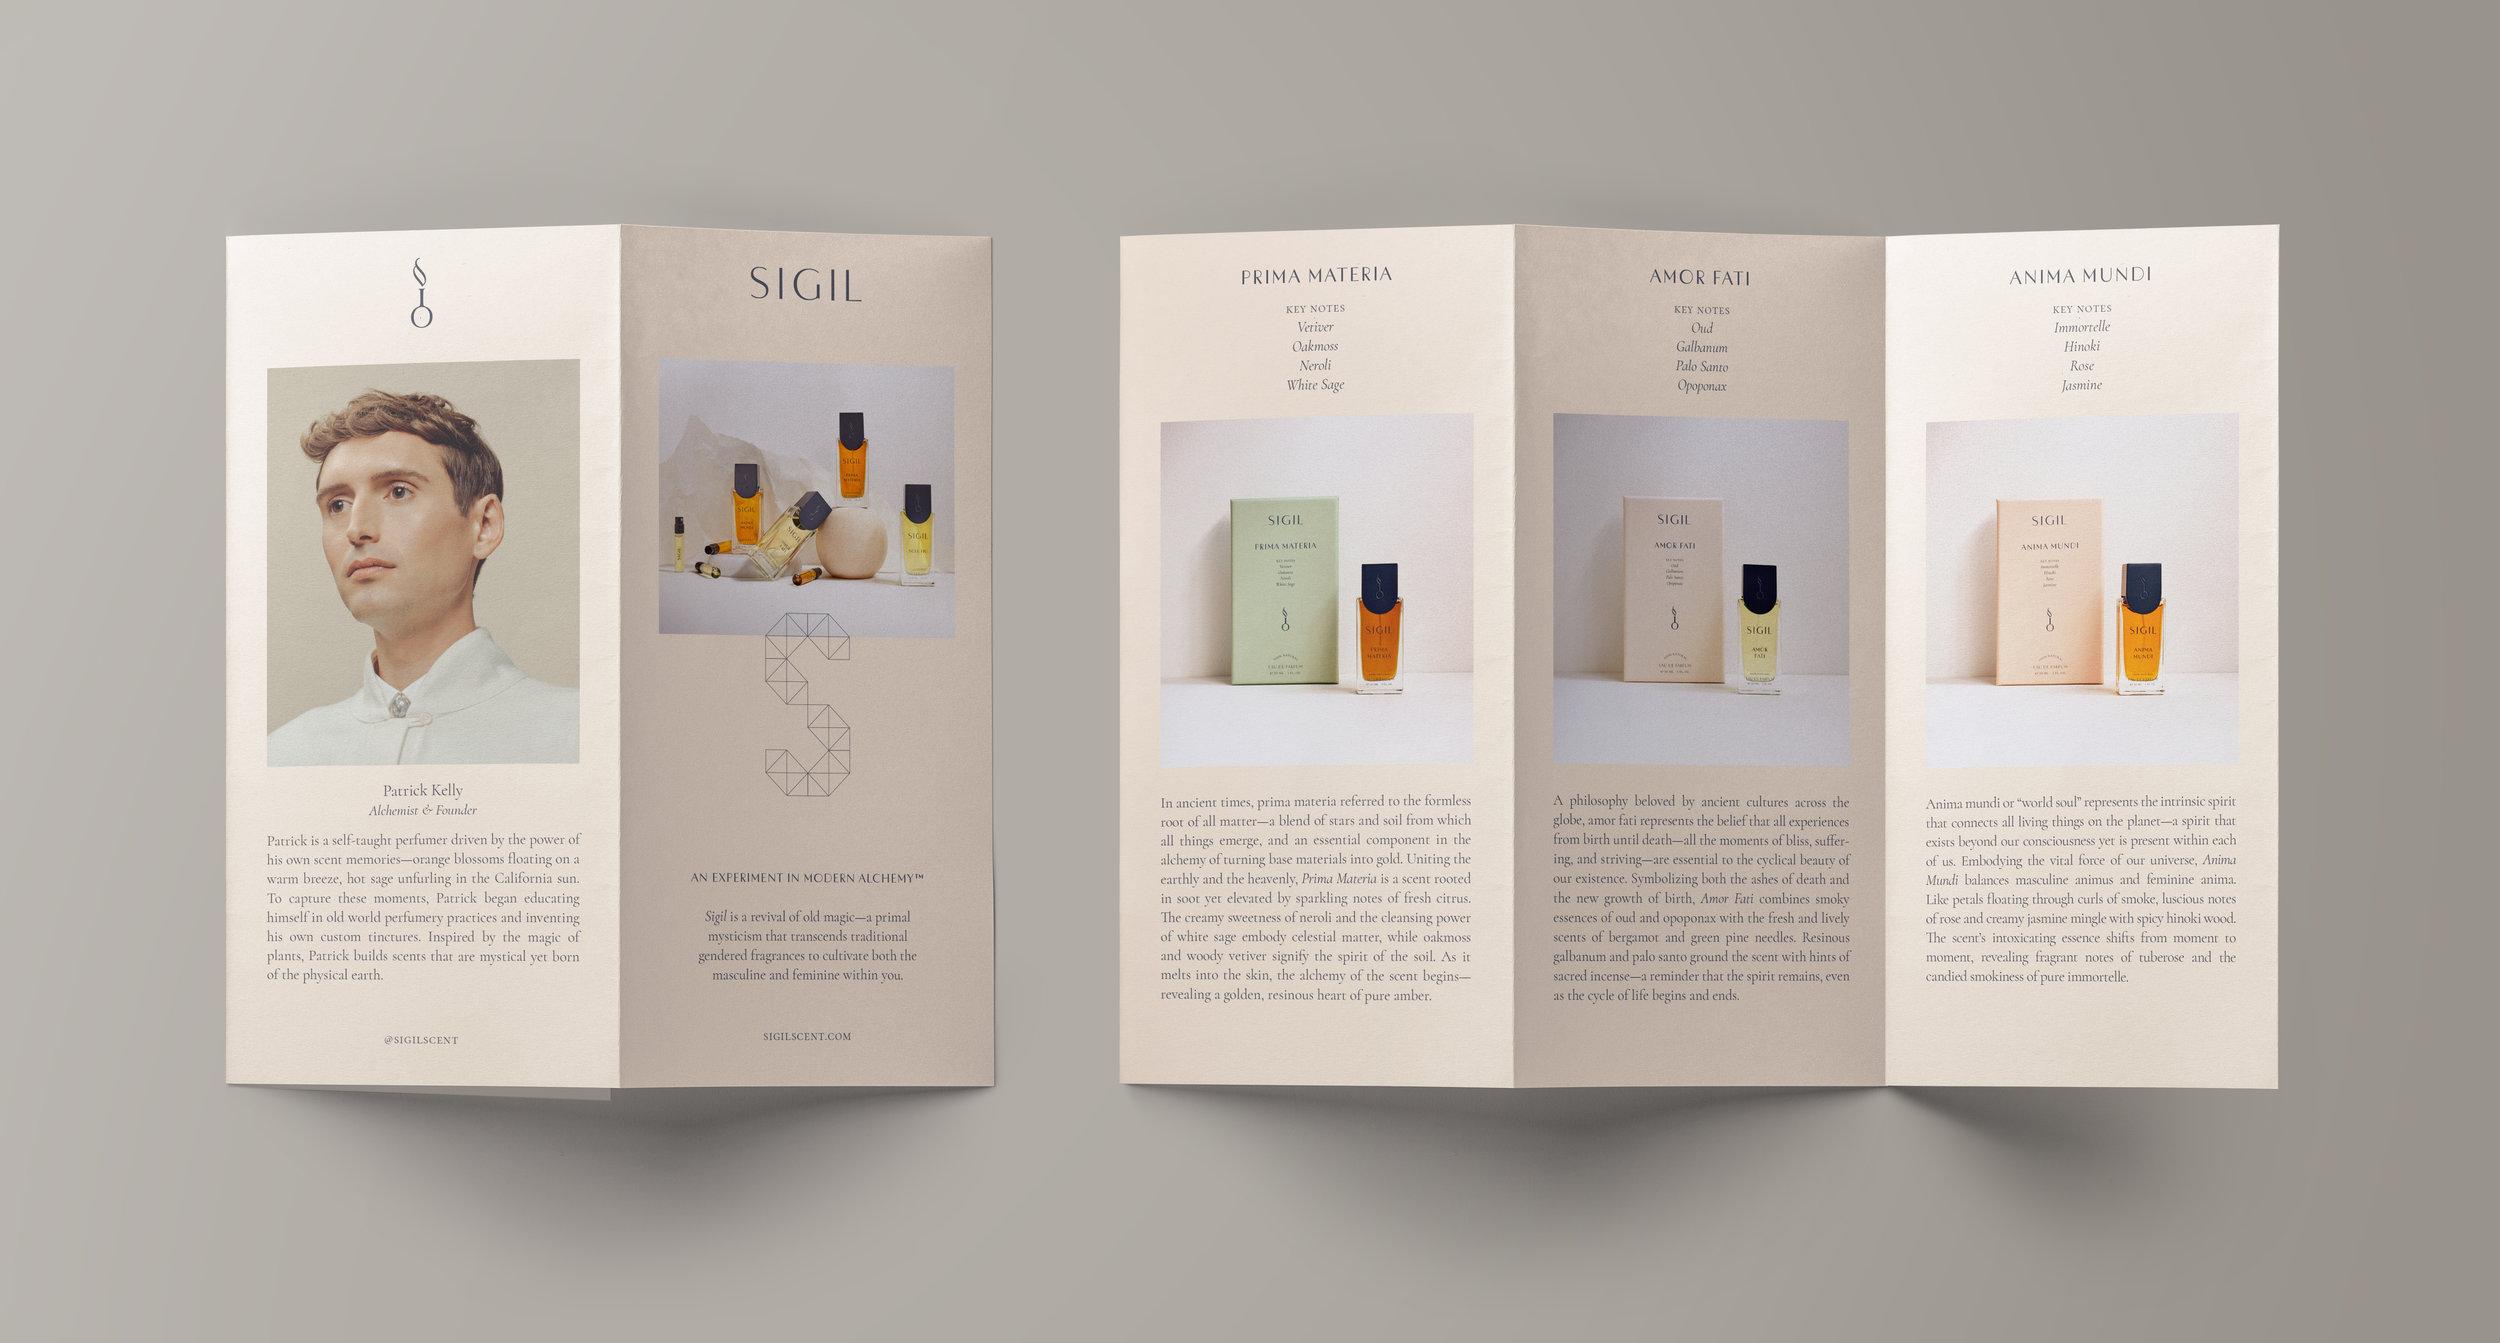 Sigil-Scent-open-brochure.jpg